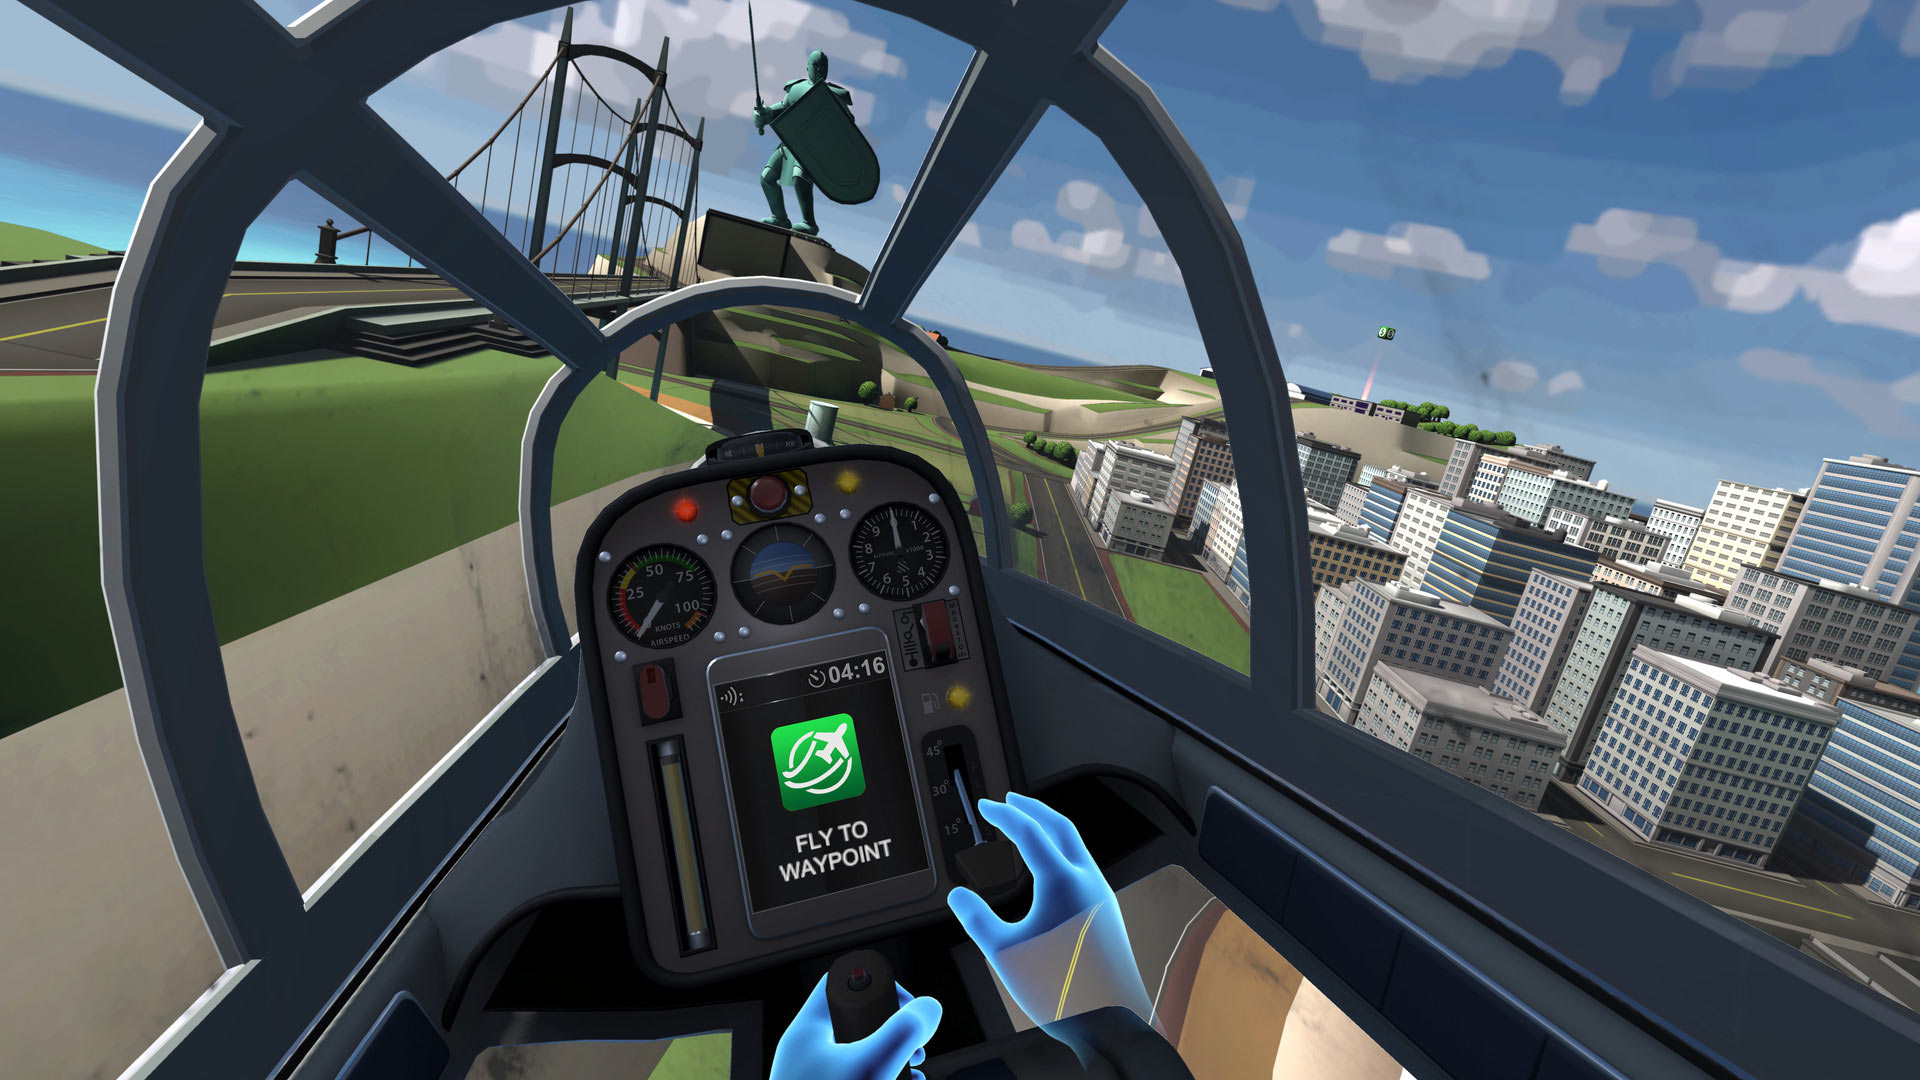 Ultrawings sur Playstation Vr